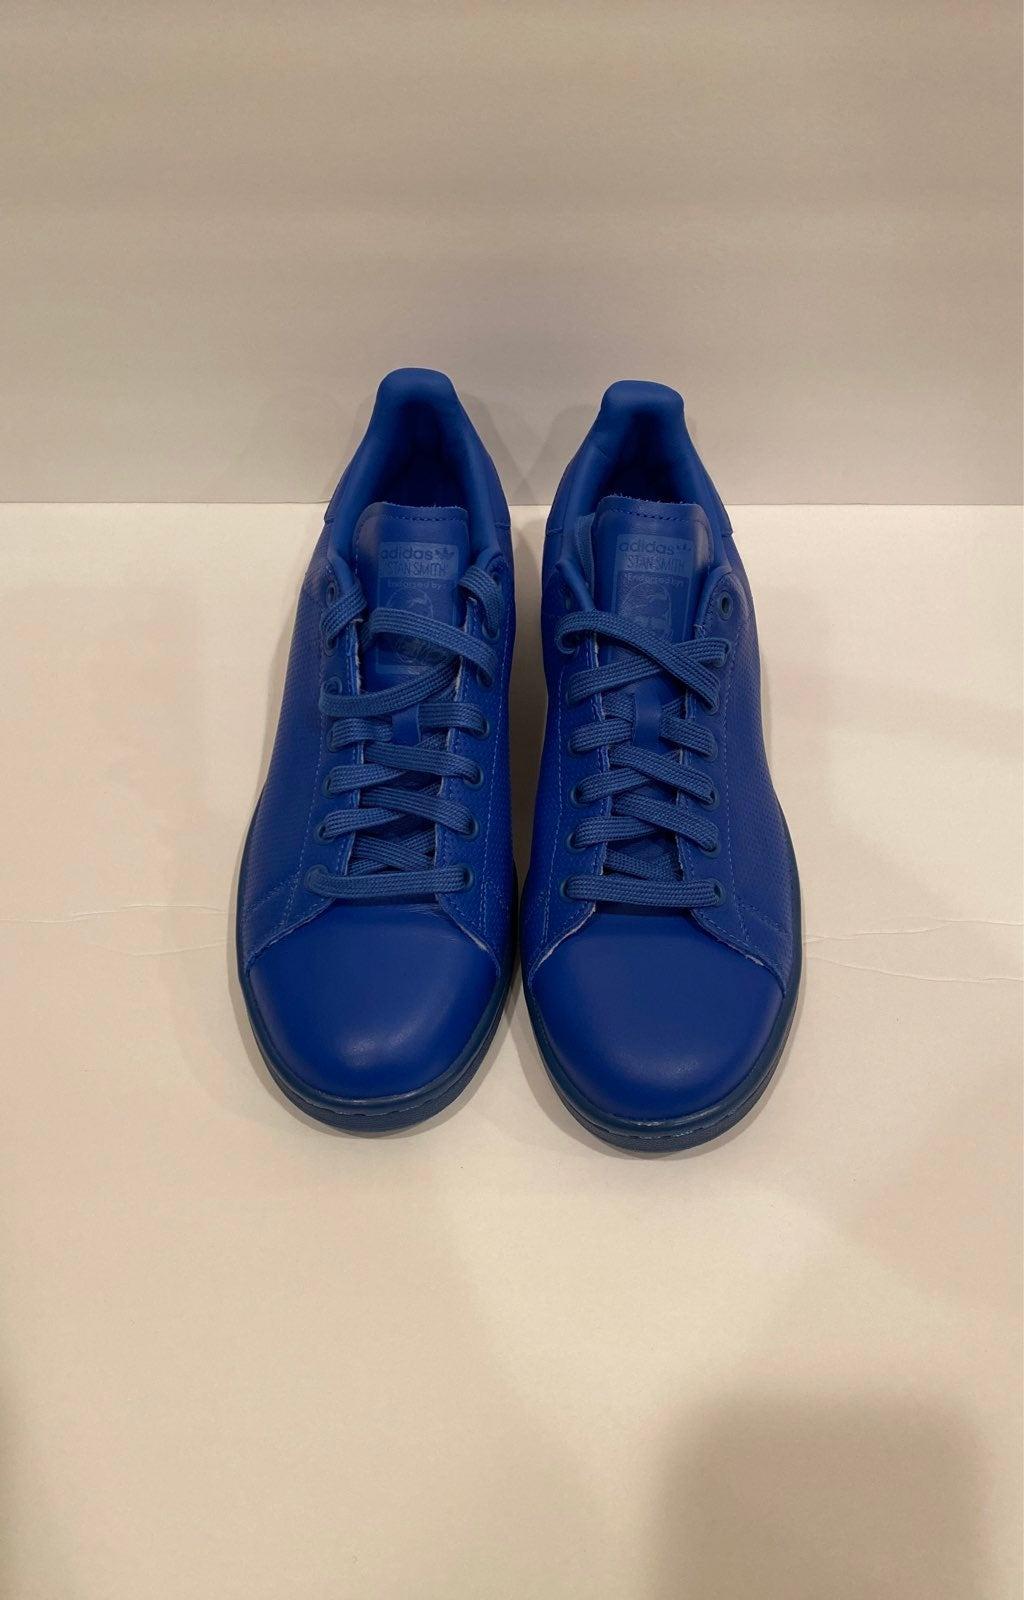 Mens Adidas Stan Smith Blue Size 9.5